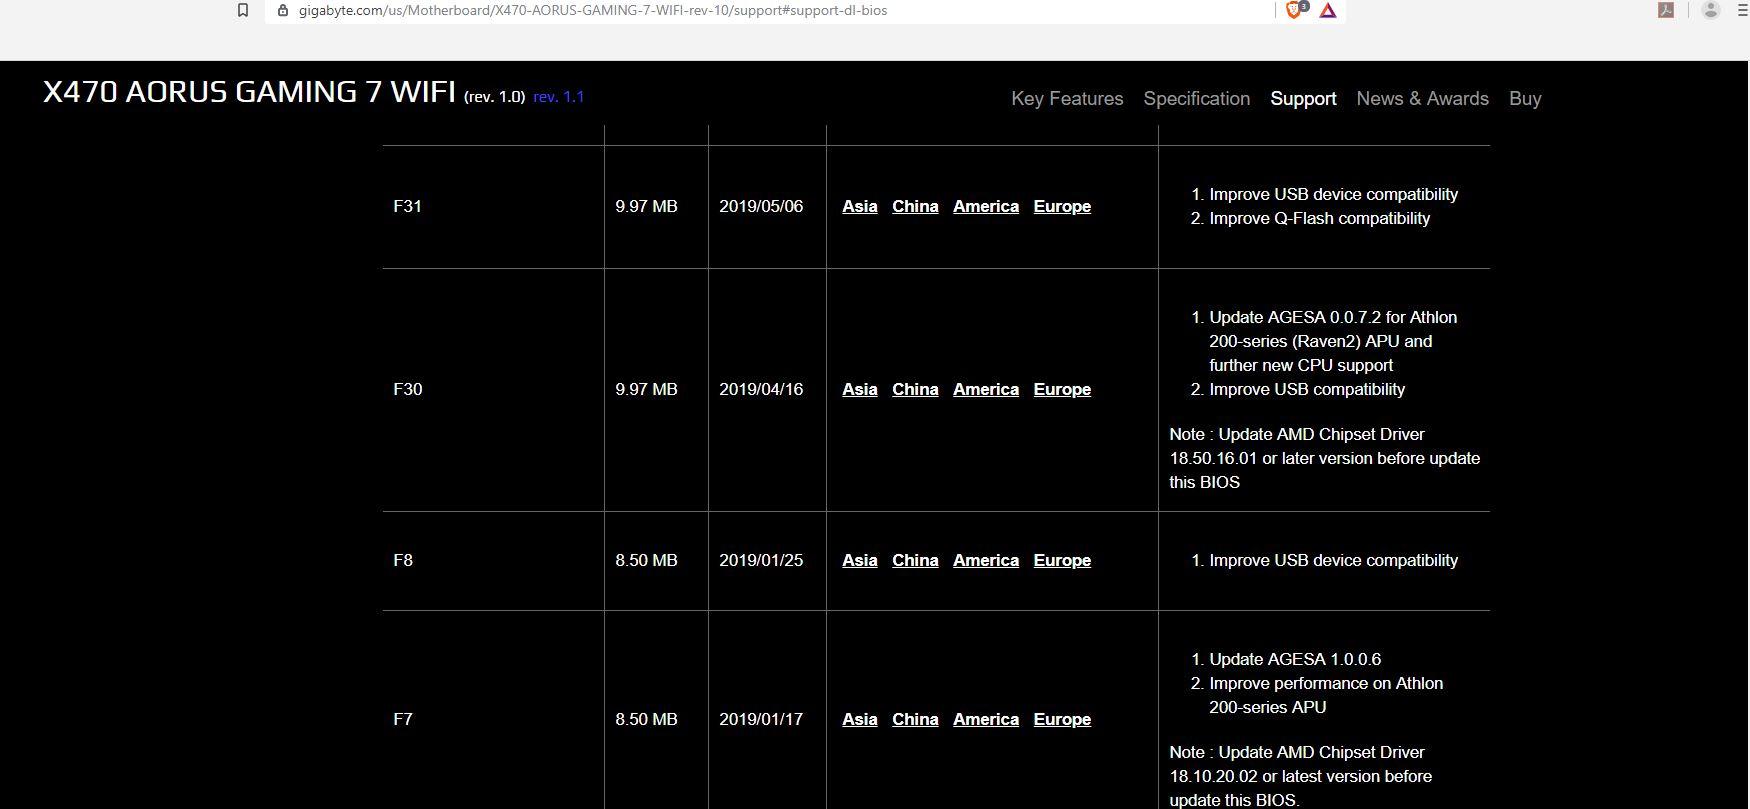 Update my Gigabyte X470 Aorus AMD chipset driver? | [H]ard|Forum